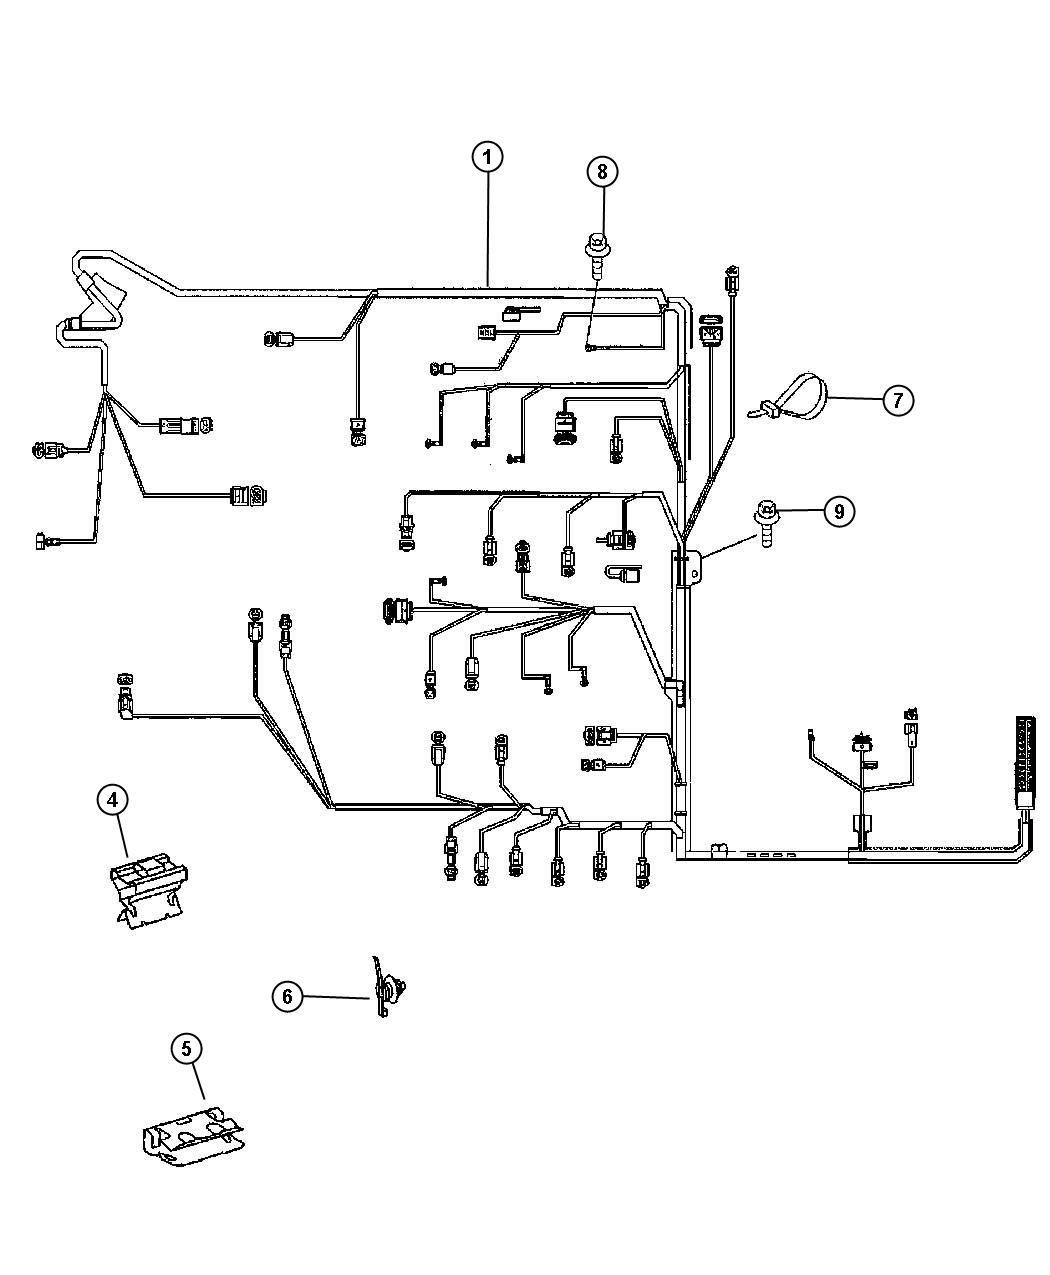 2009 Dodge SPRINTER 3500 Wiring. Battery, alternator, amp